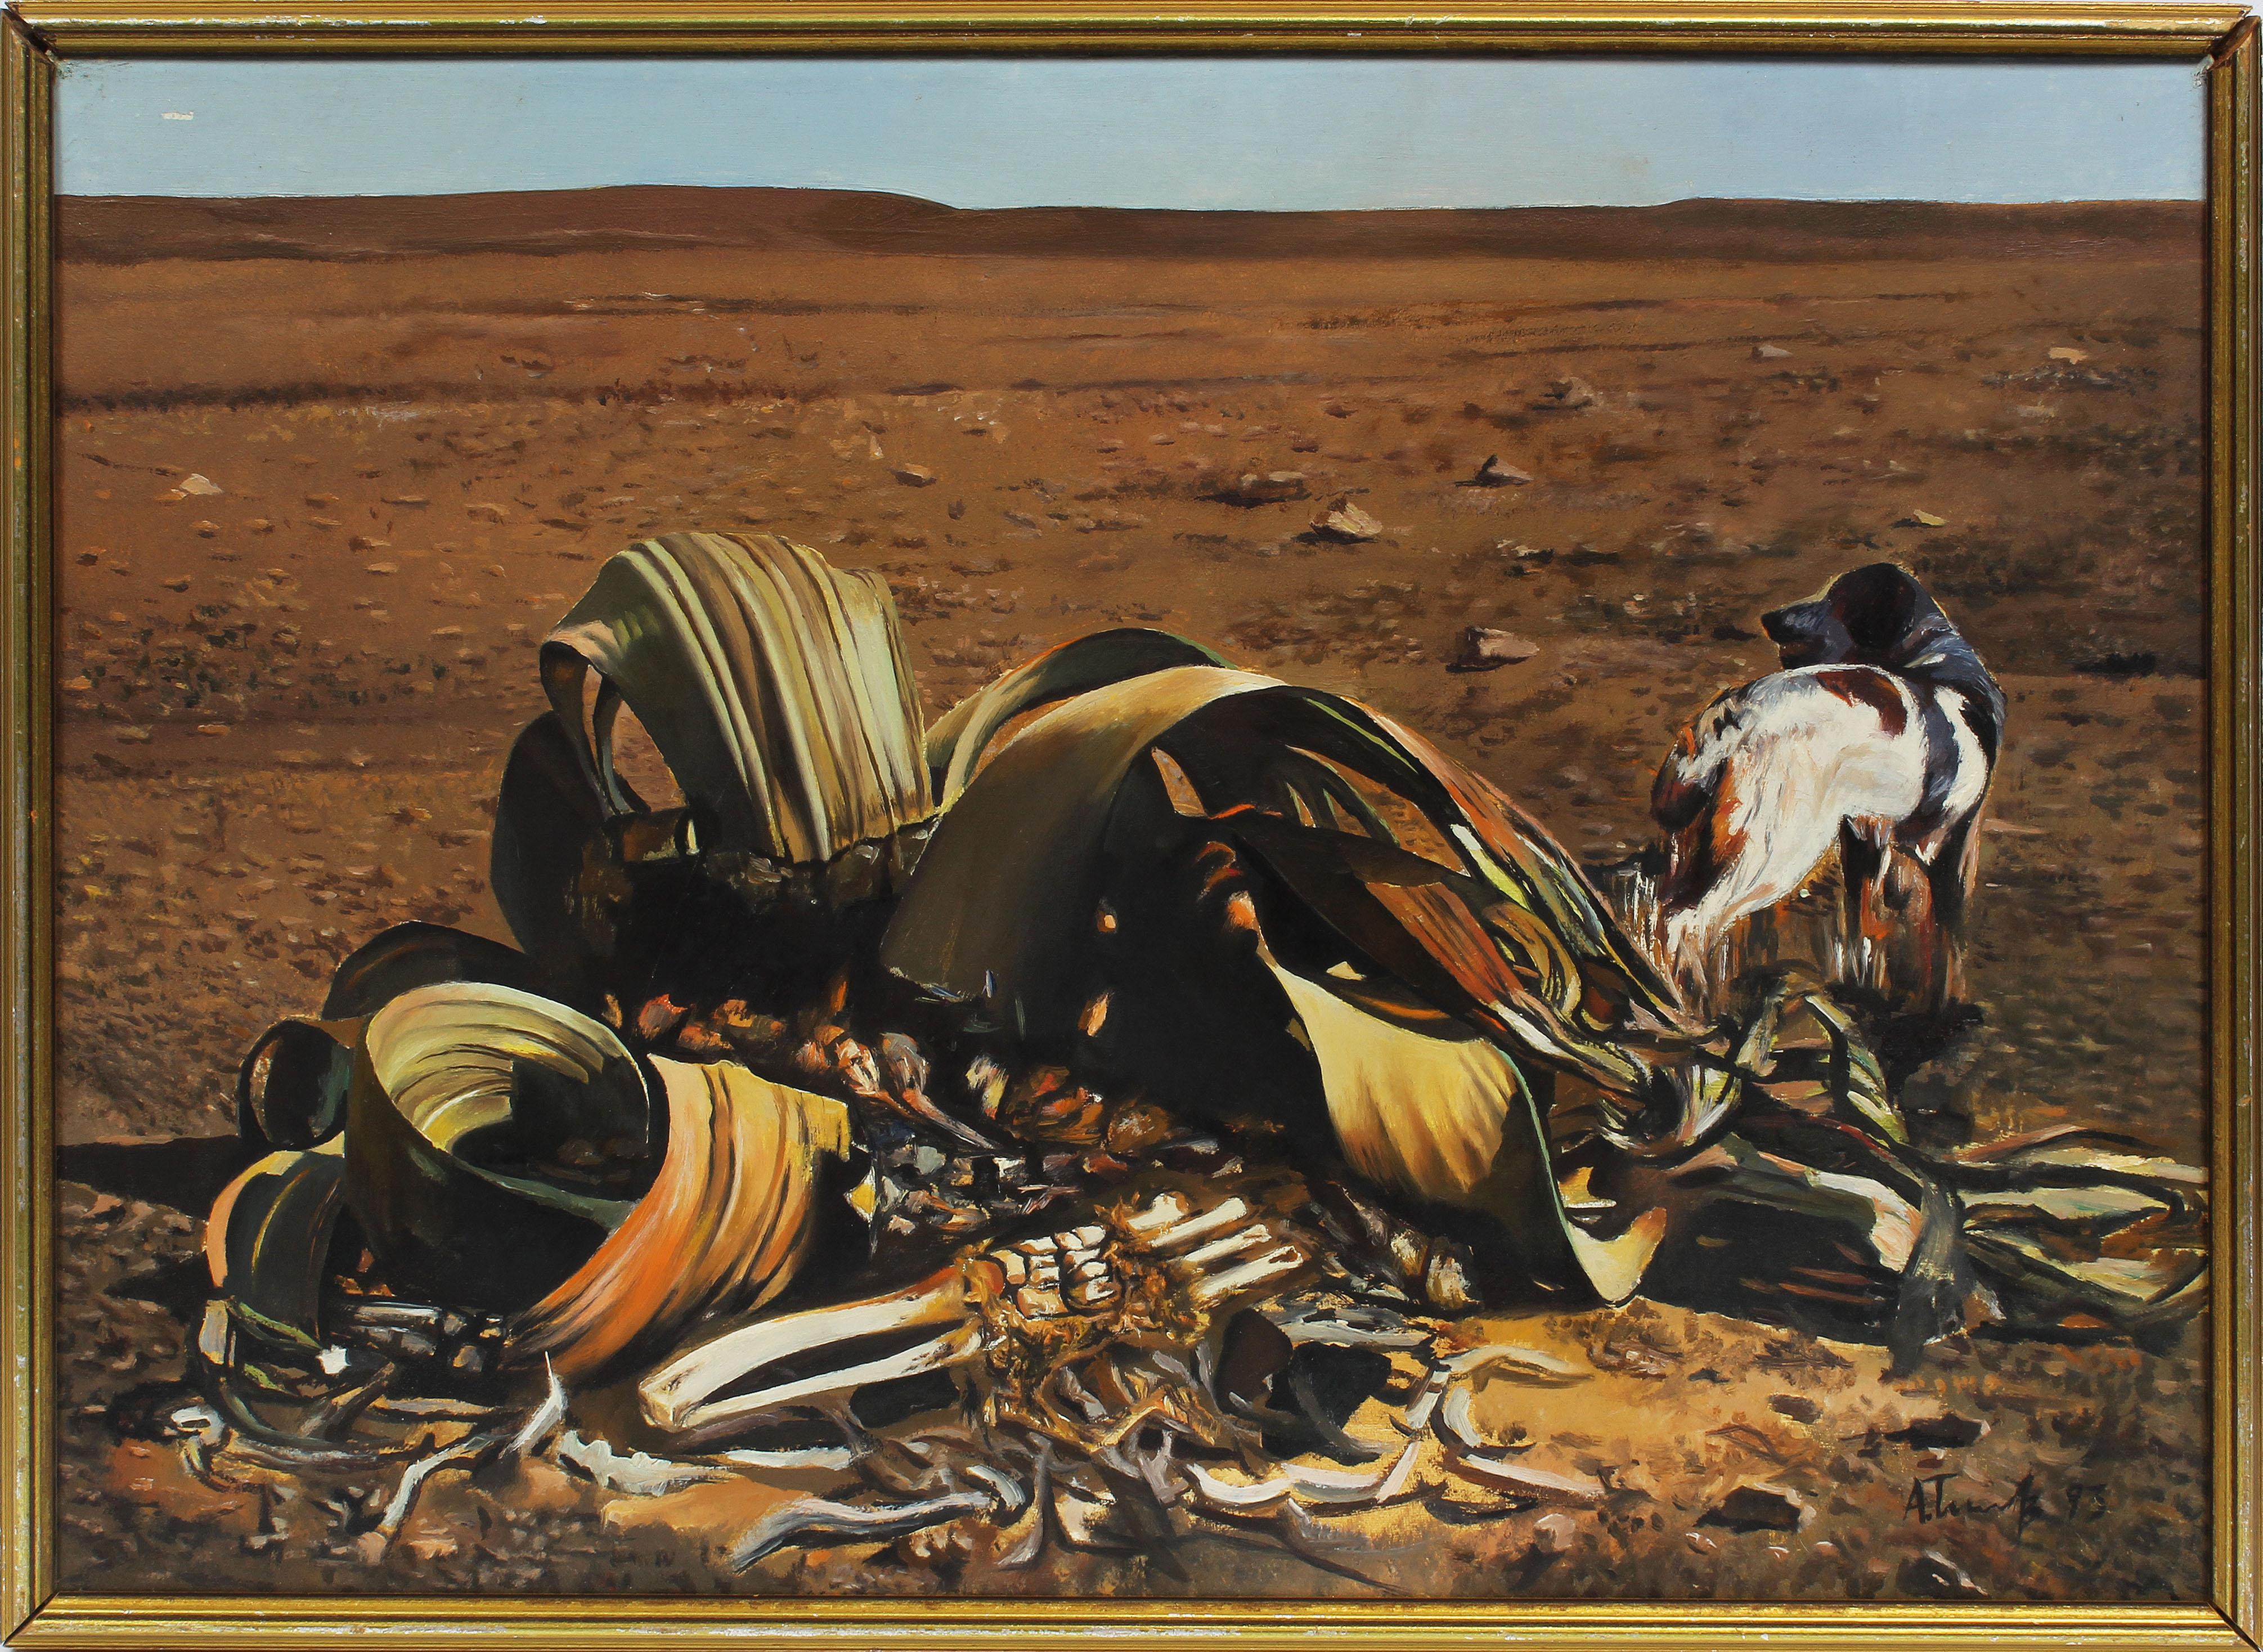 Vintage Surreal Trompe L'Oeil Dog Landscape Signed Original Oil Painting